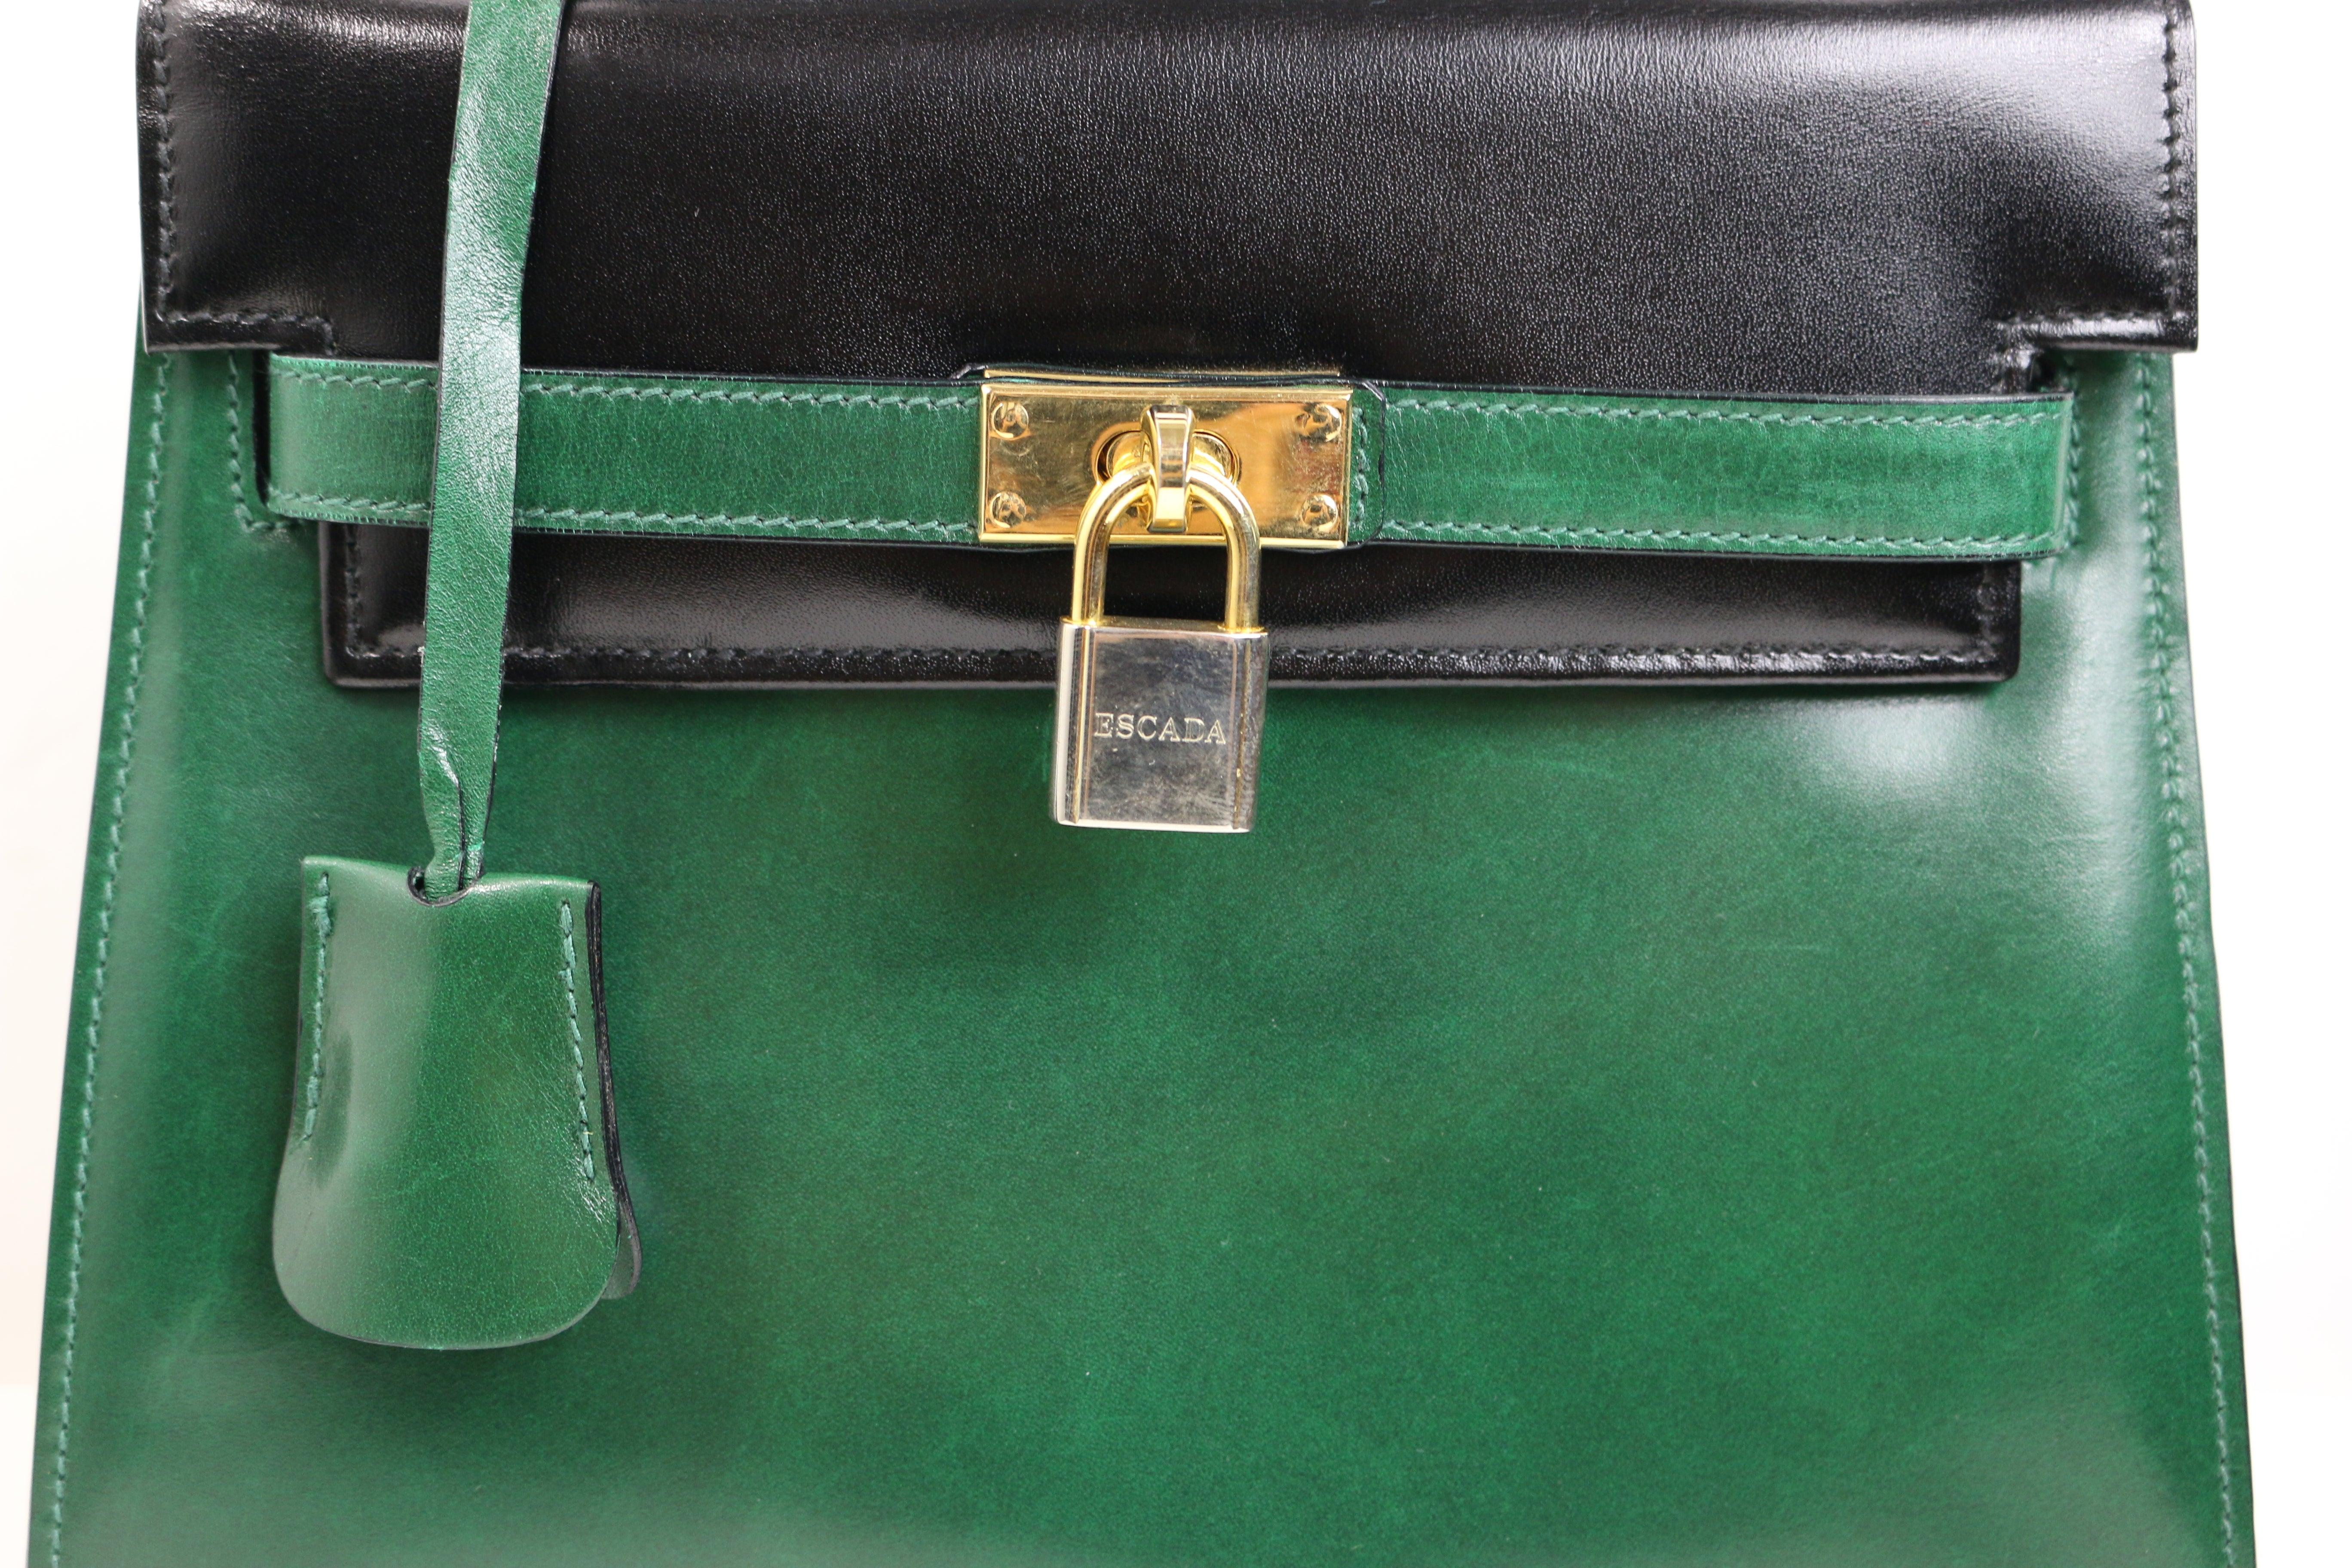 Escada Green And Black Patent Leather Handbag lptx92